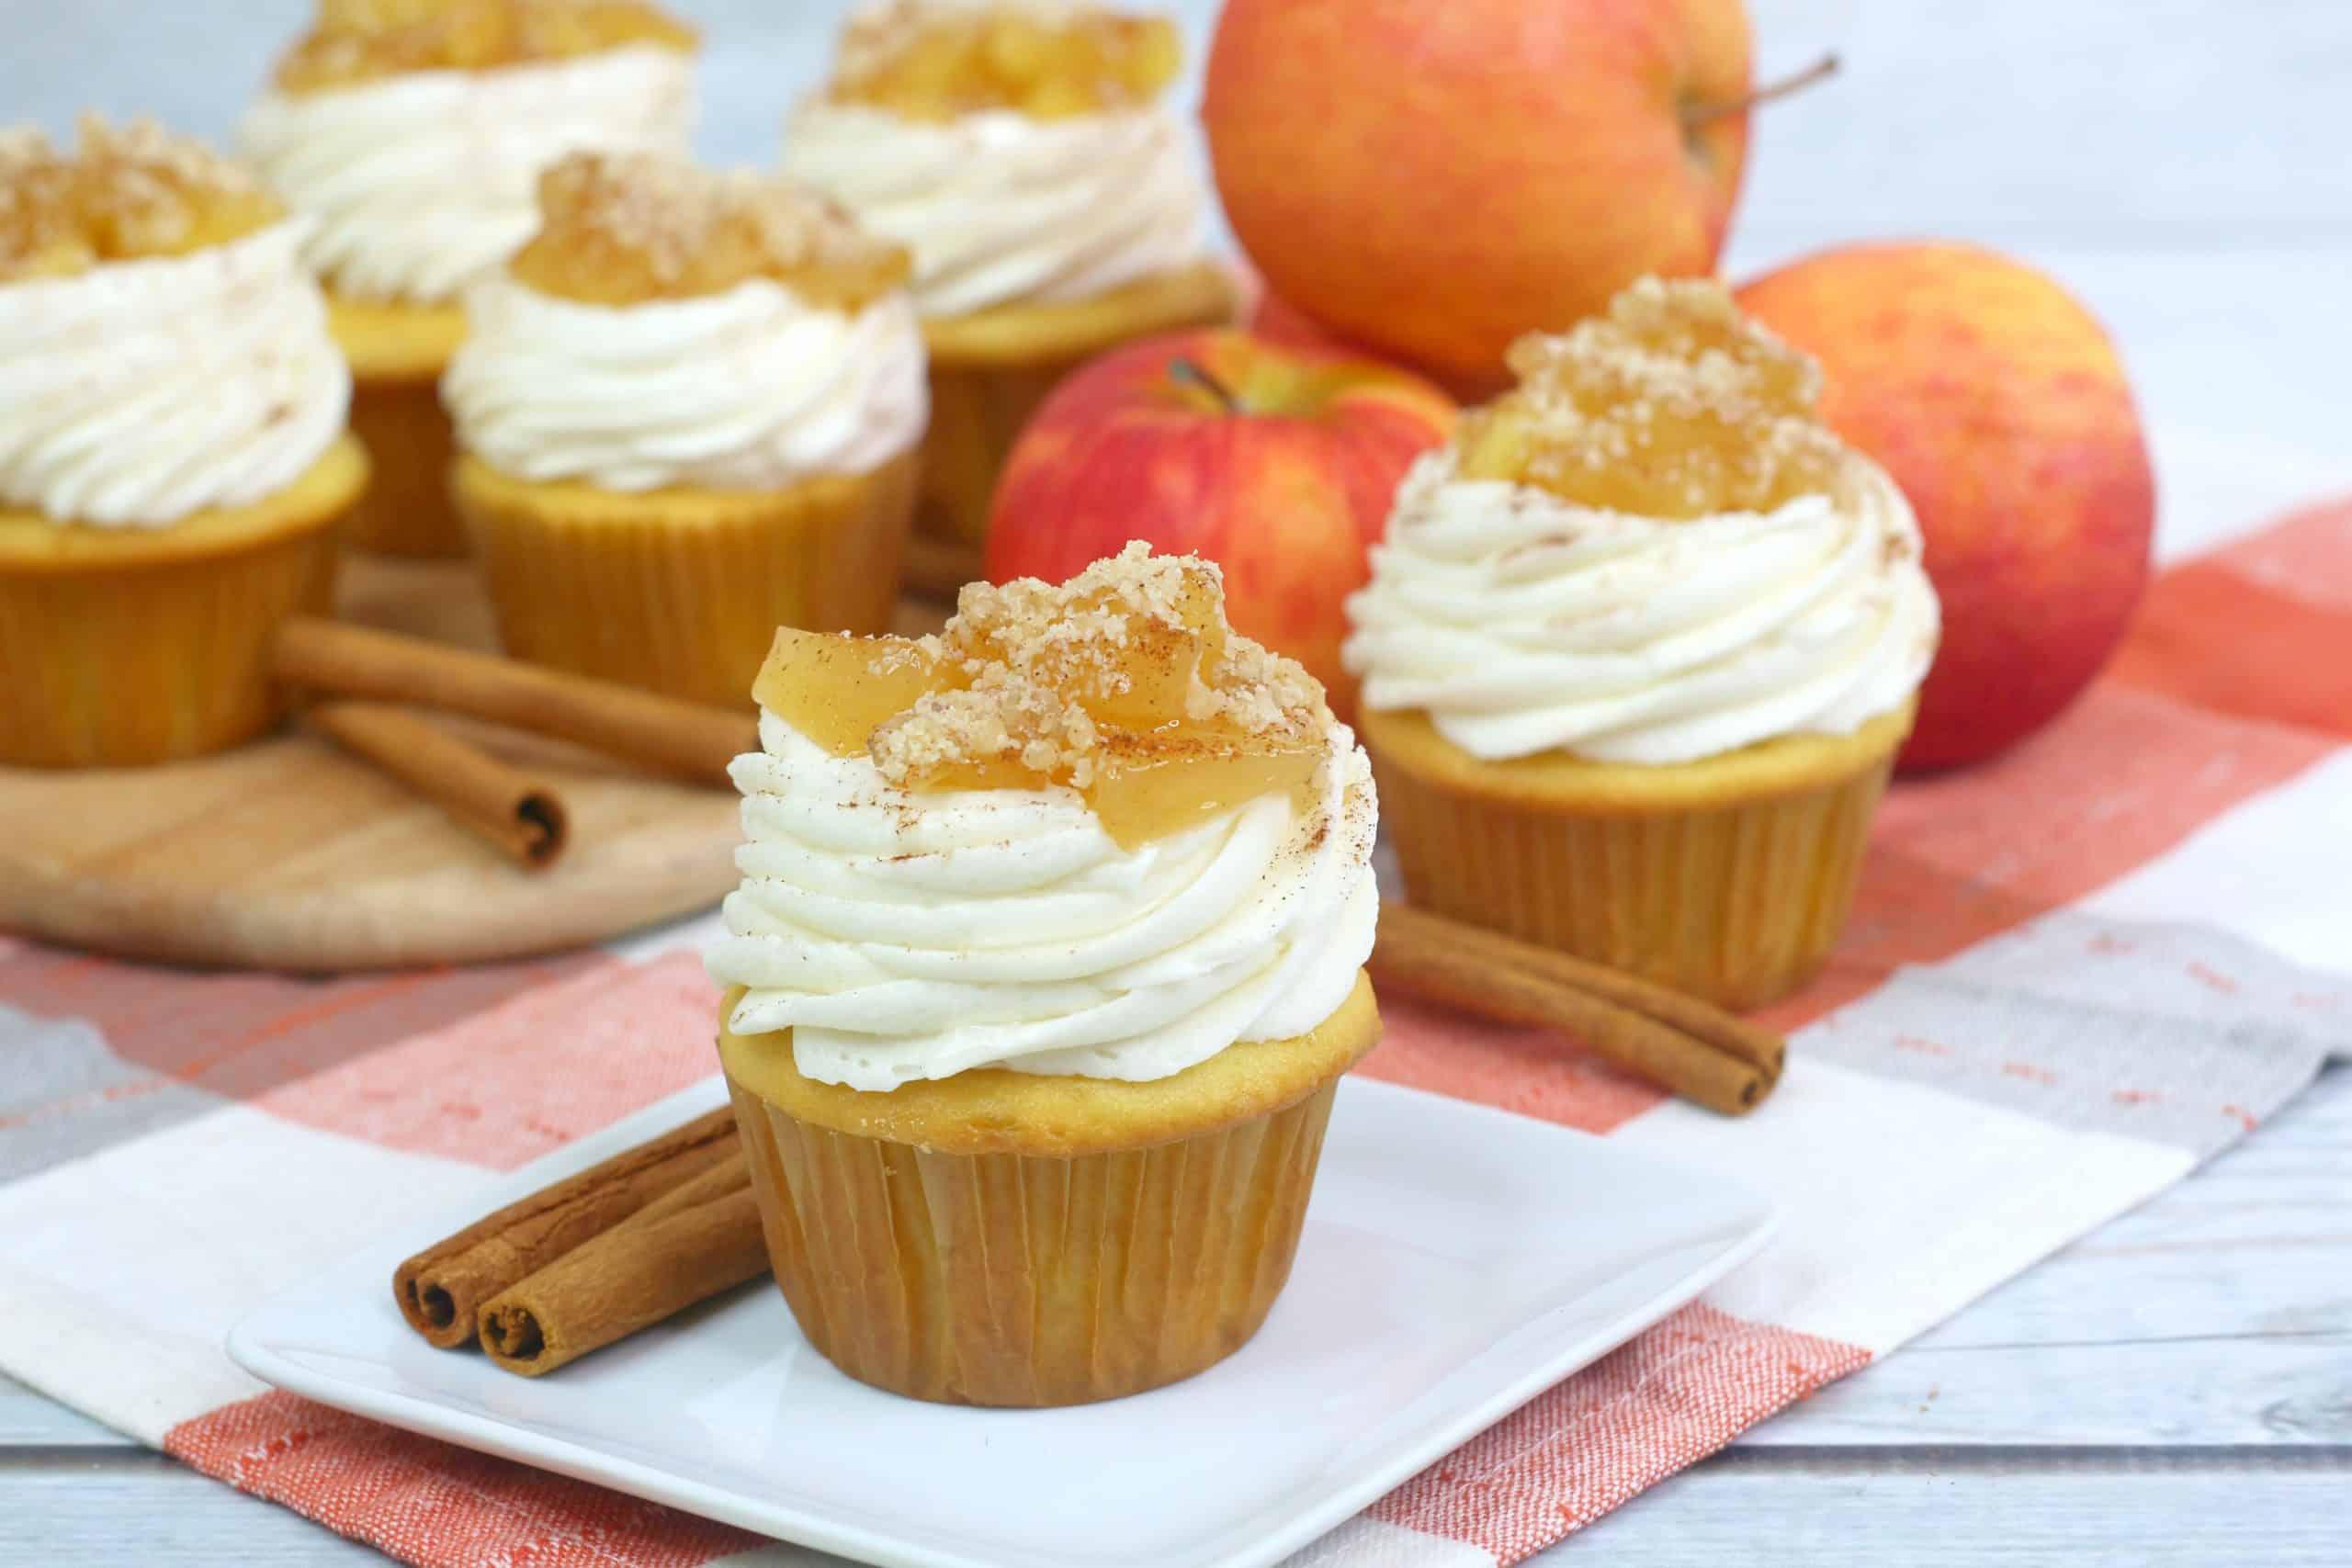 Apple Pie Cupcakes on plate